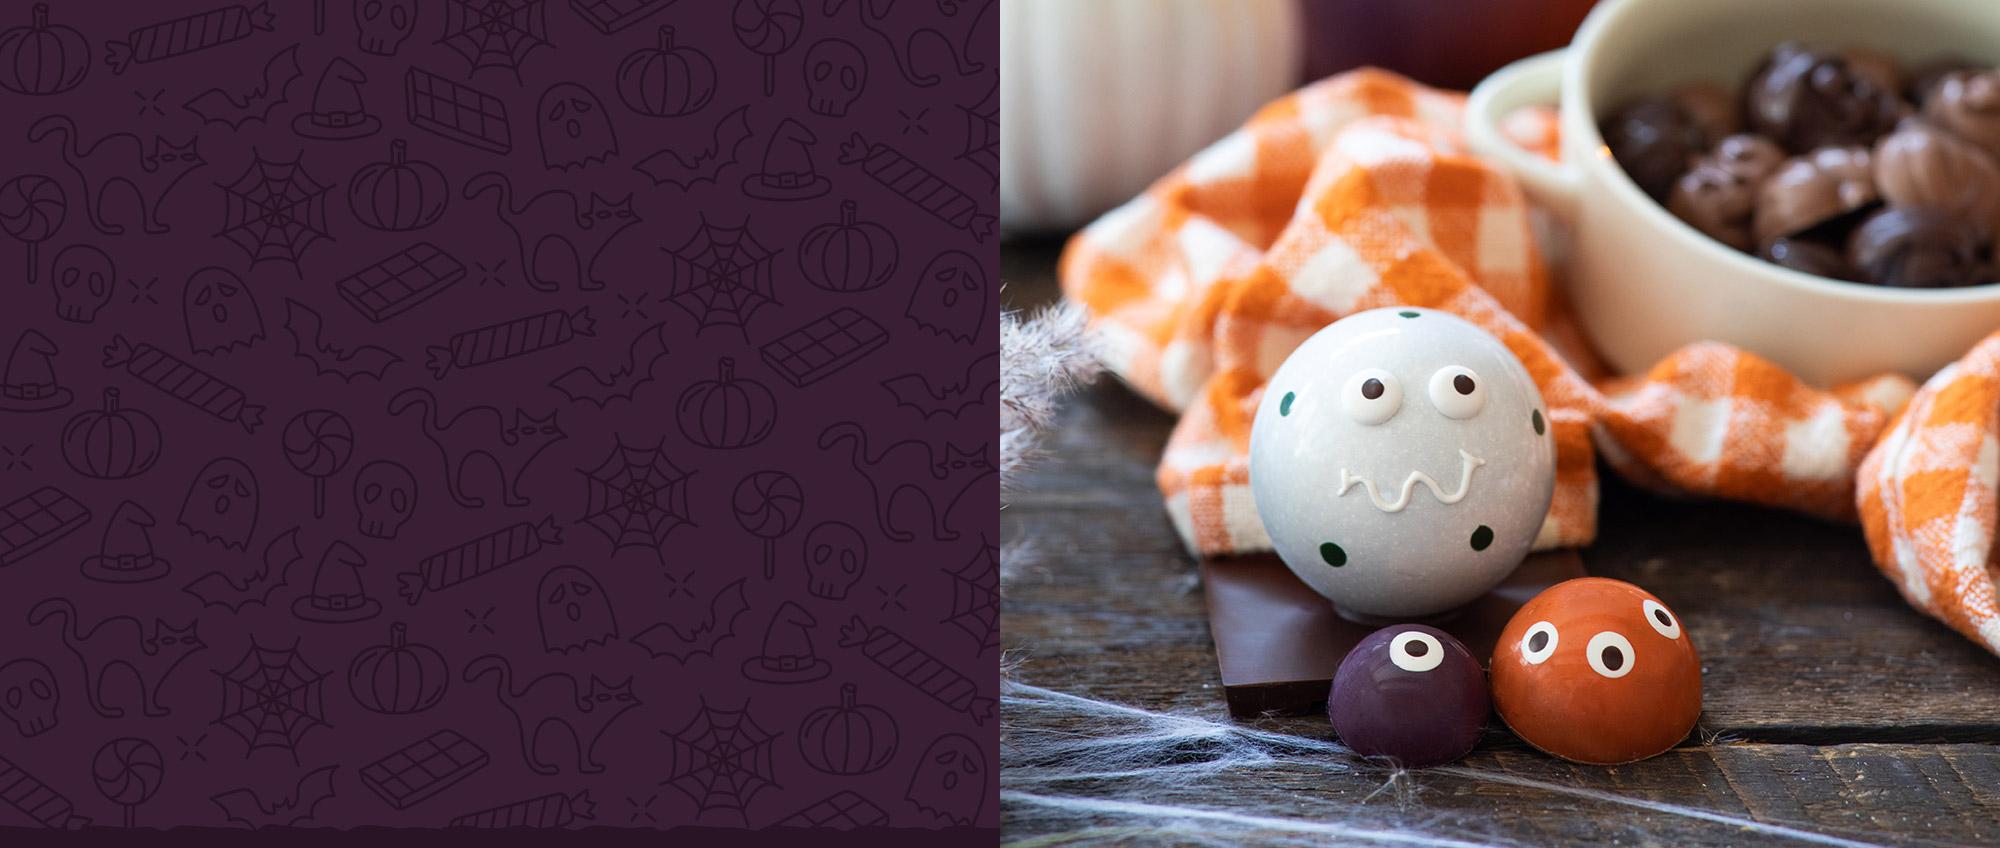 ChocoChocolat_Slider-Halloween-Mignons_2000x848